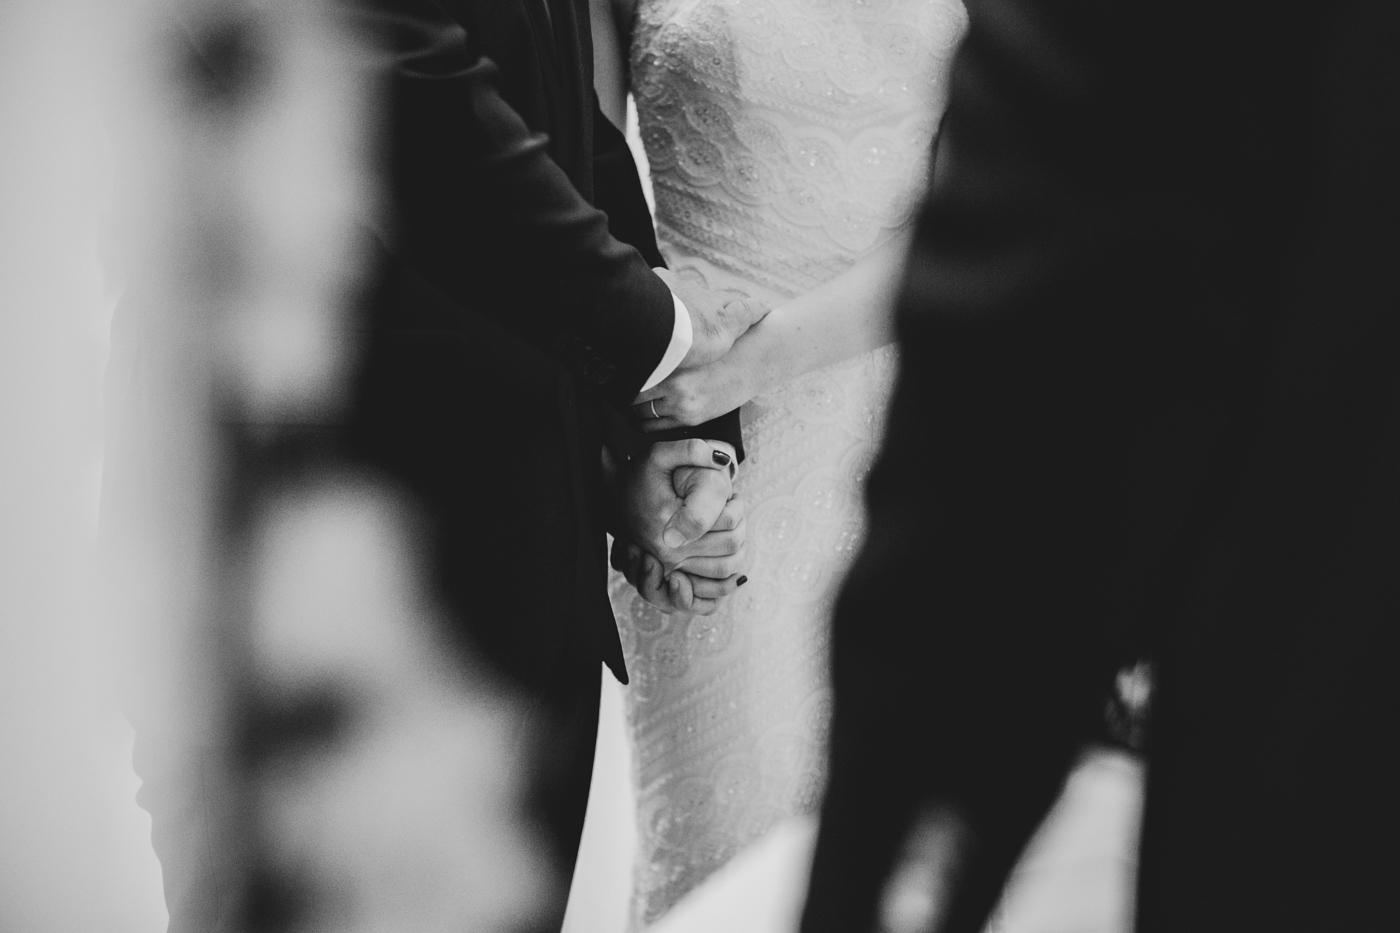 Jo & Tom Wedding - The Grounds of Alexandria - Samantha Heather Photography-134.jpg